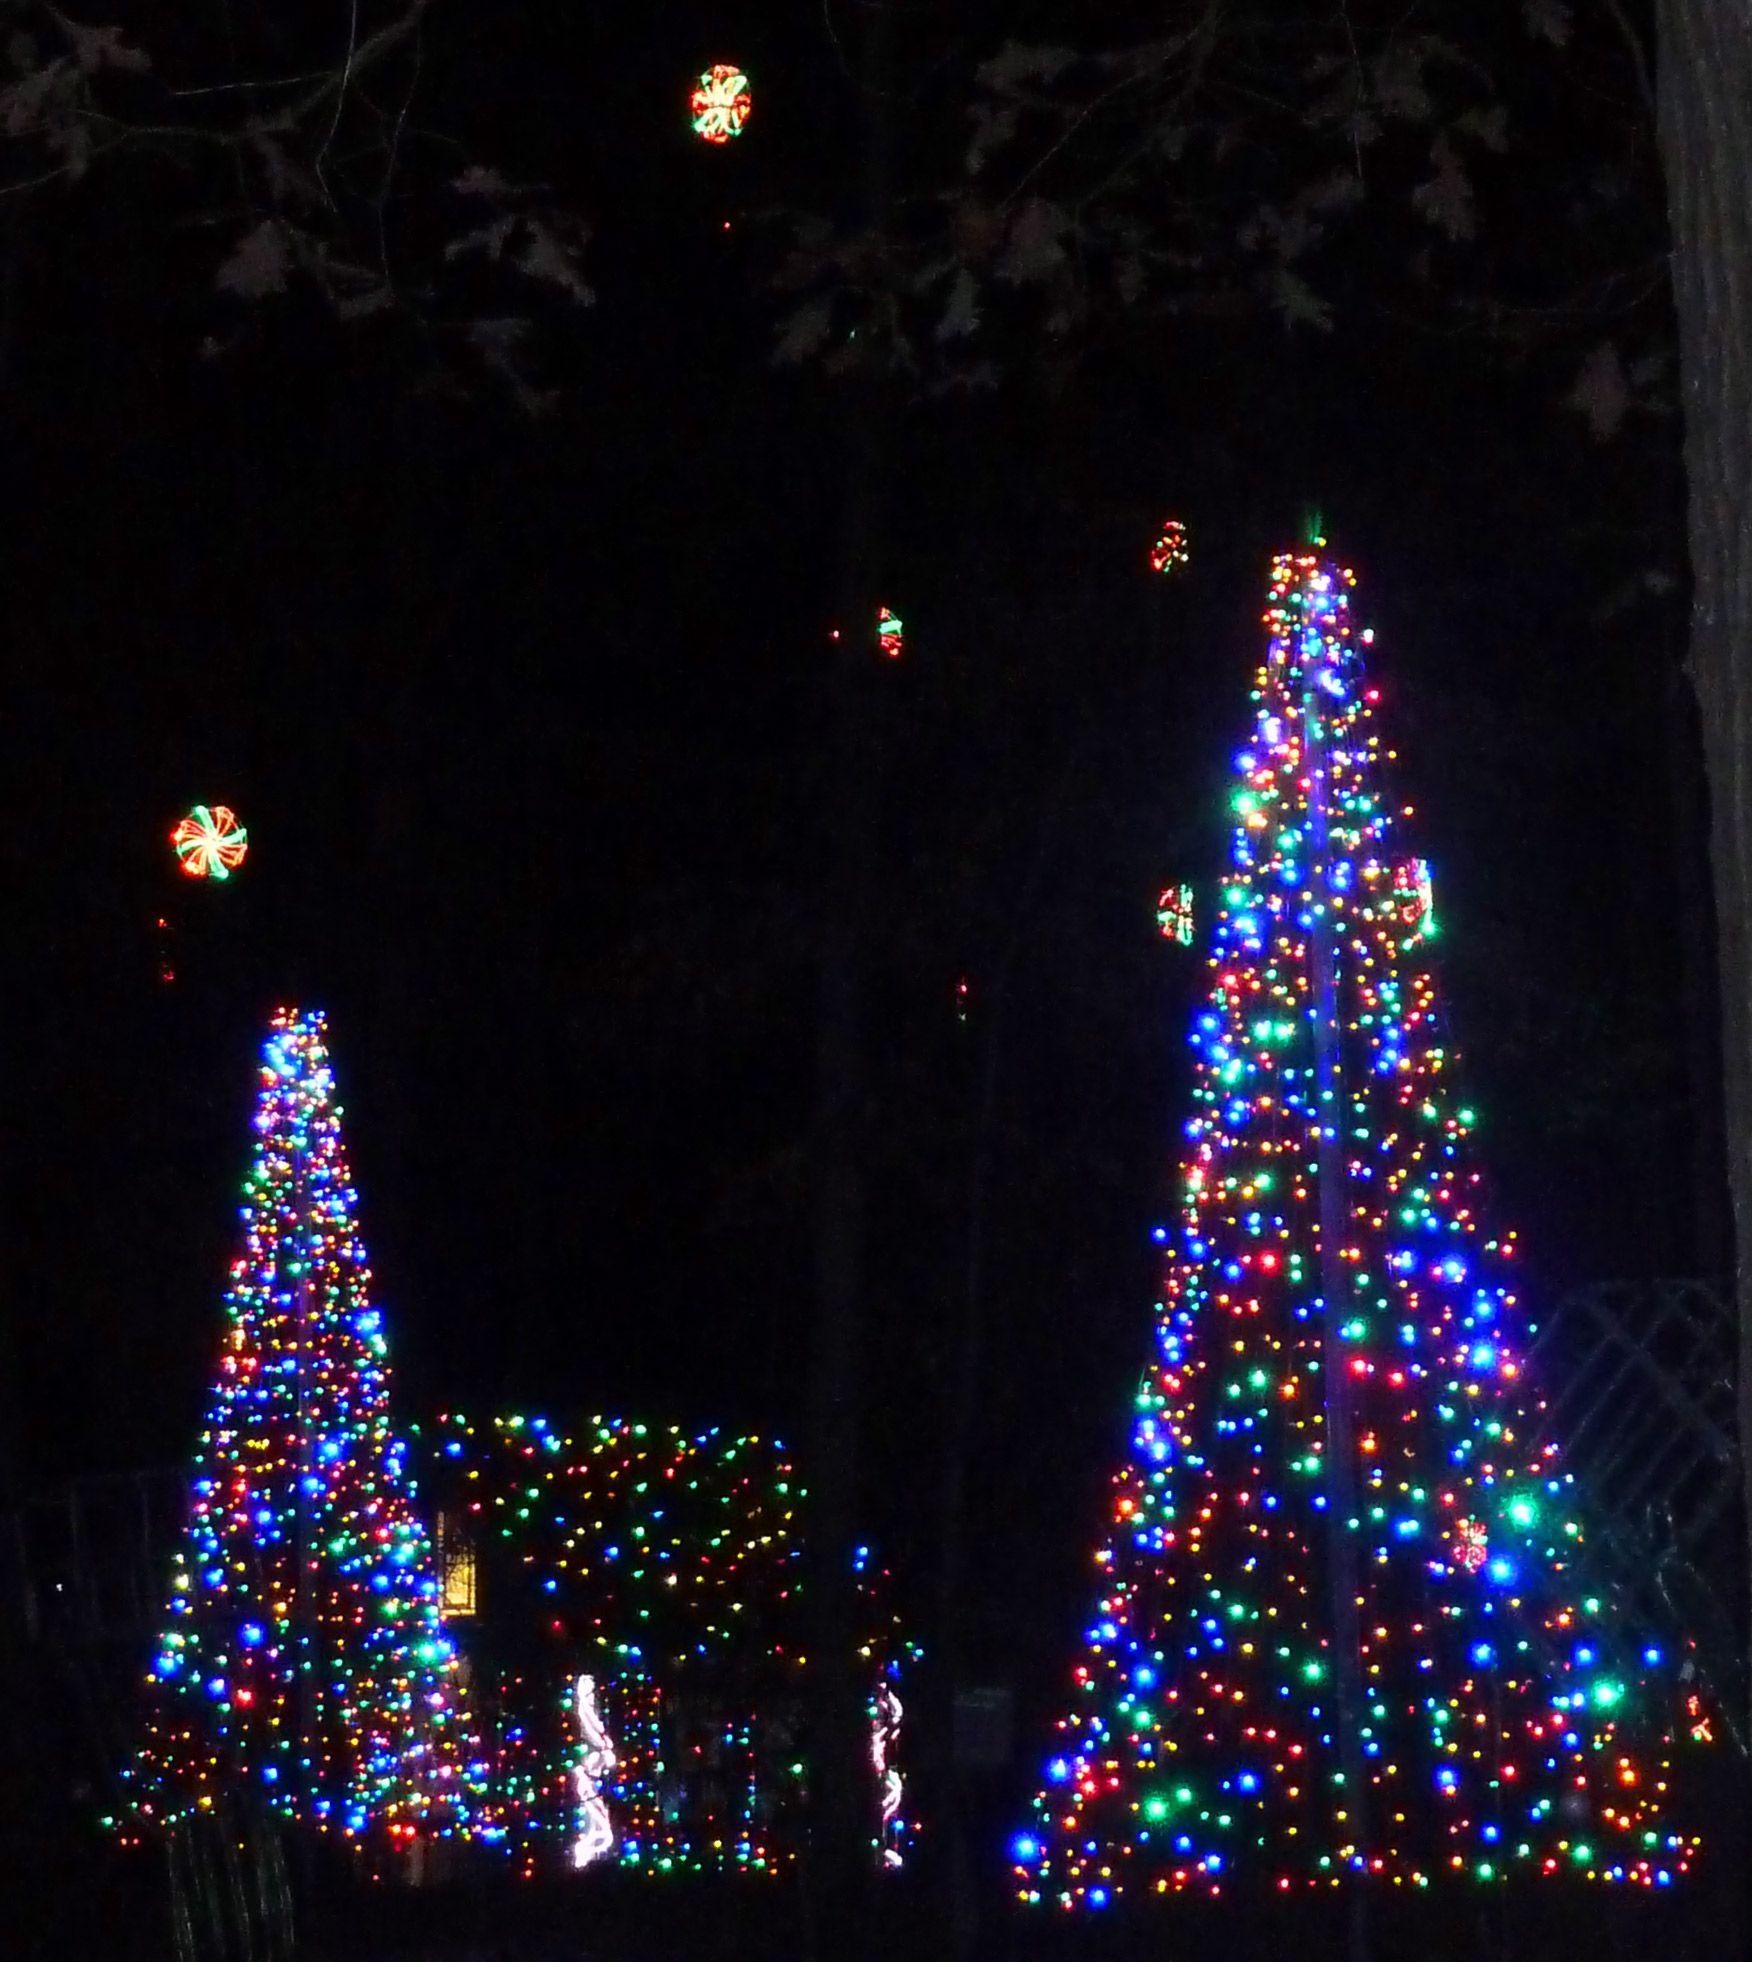 a4138ee47e342f57d938eea8d4fdbed6 - Garvan Gardens Hot Springs Christmas Lights